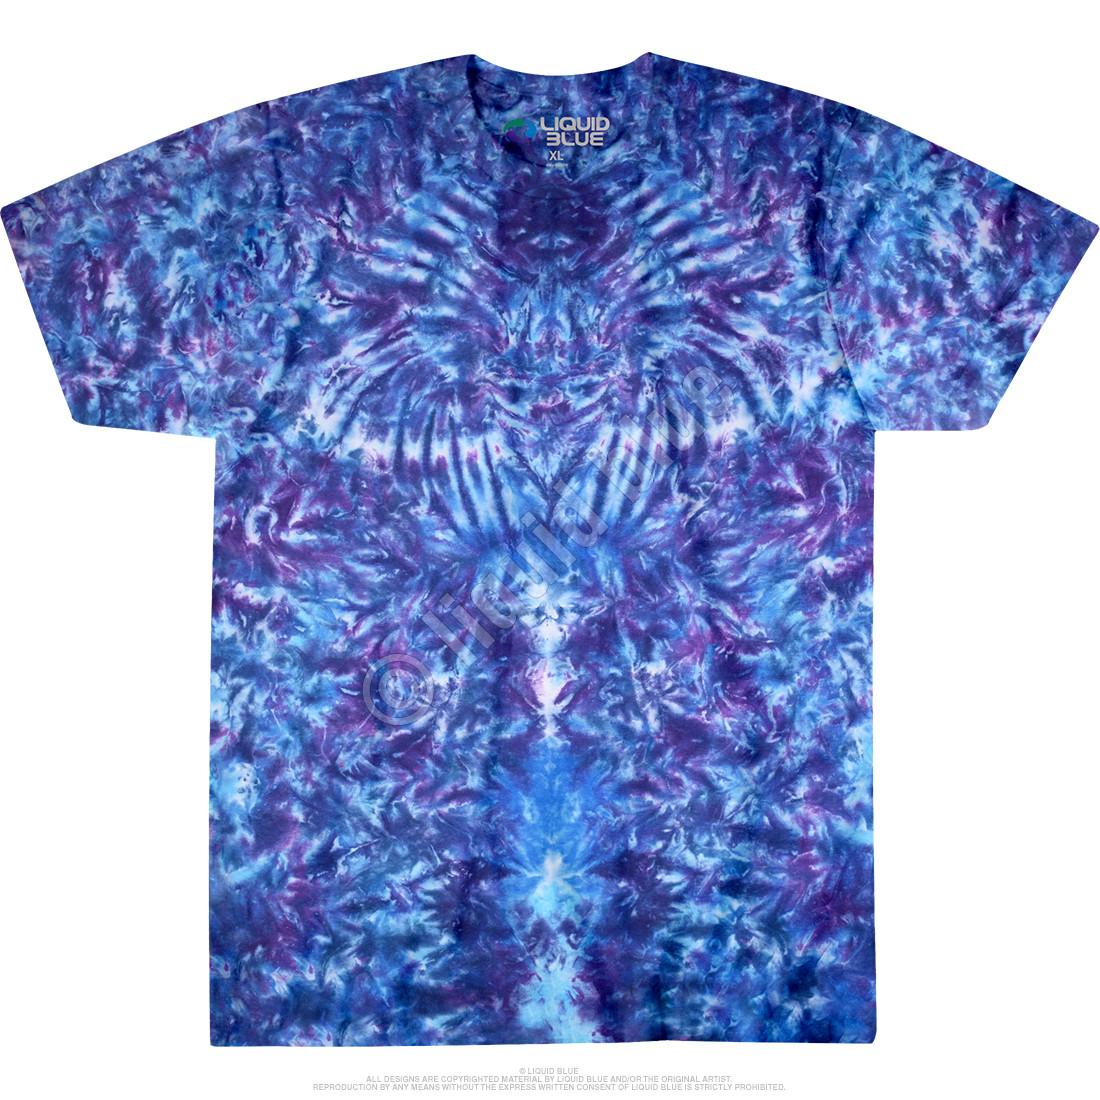 Crazy Blue Krinkle Unprinted Tie-Dye T-Shirt